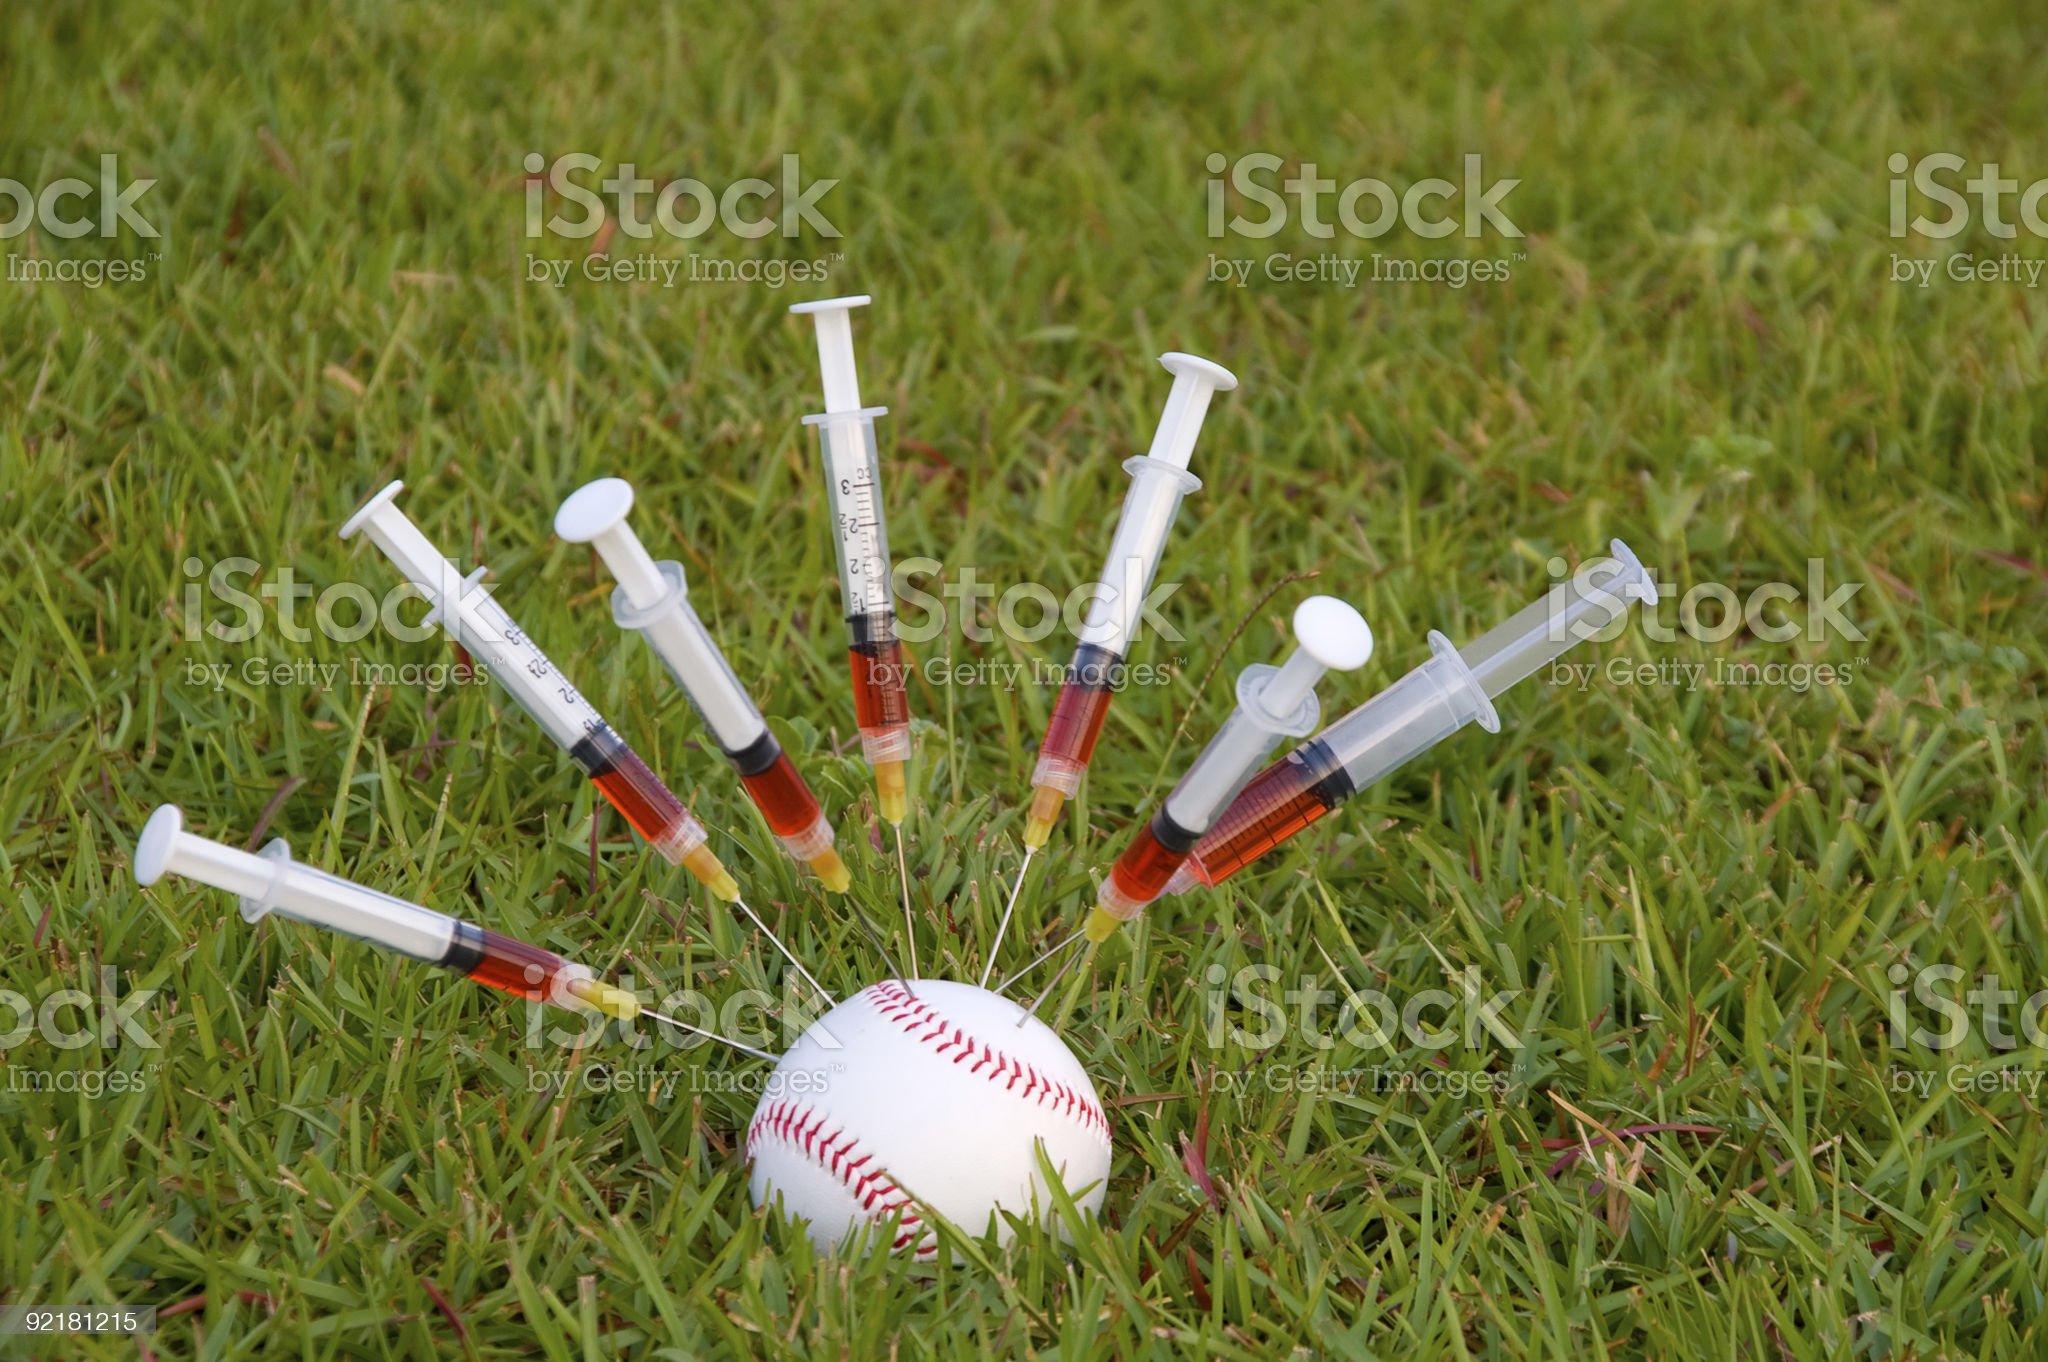 Baseball Steroids royalty-free stock photo